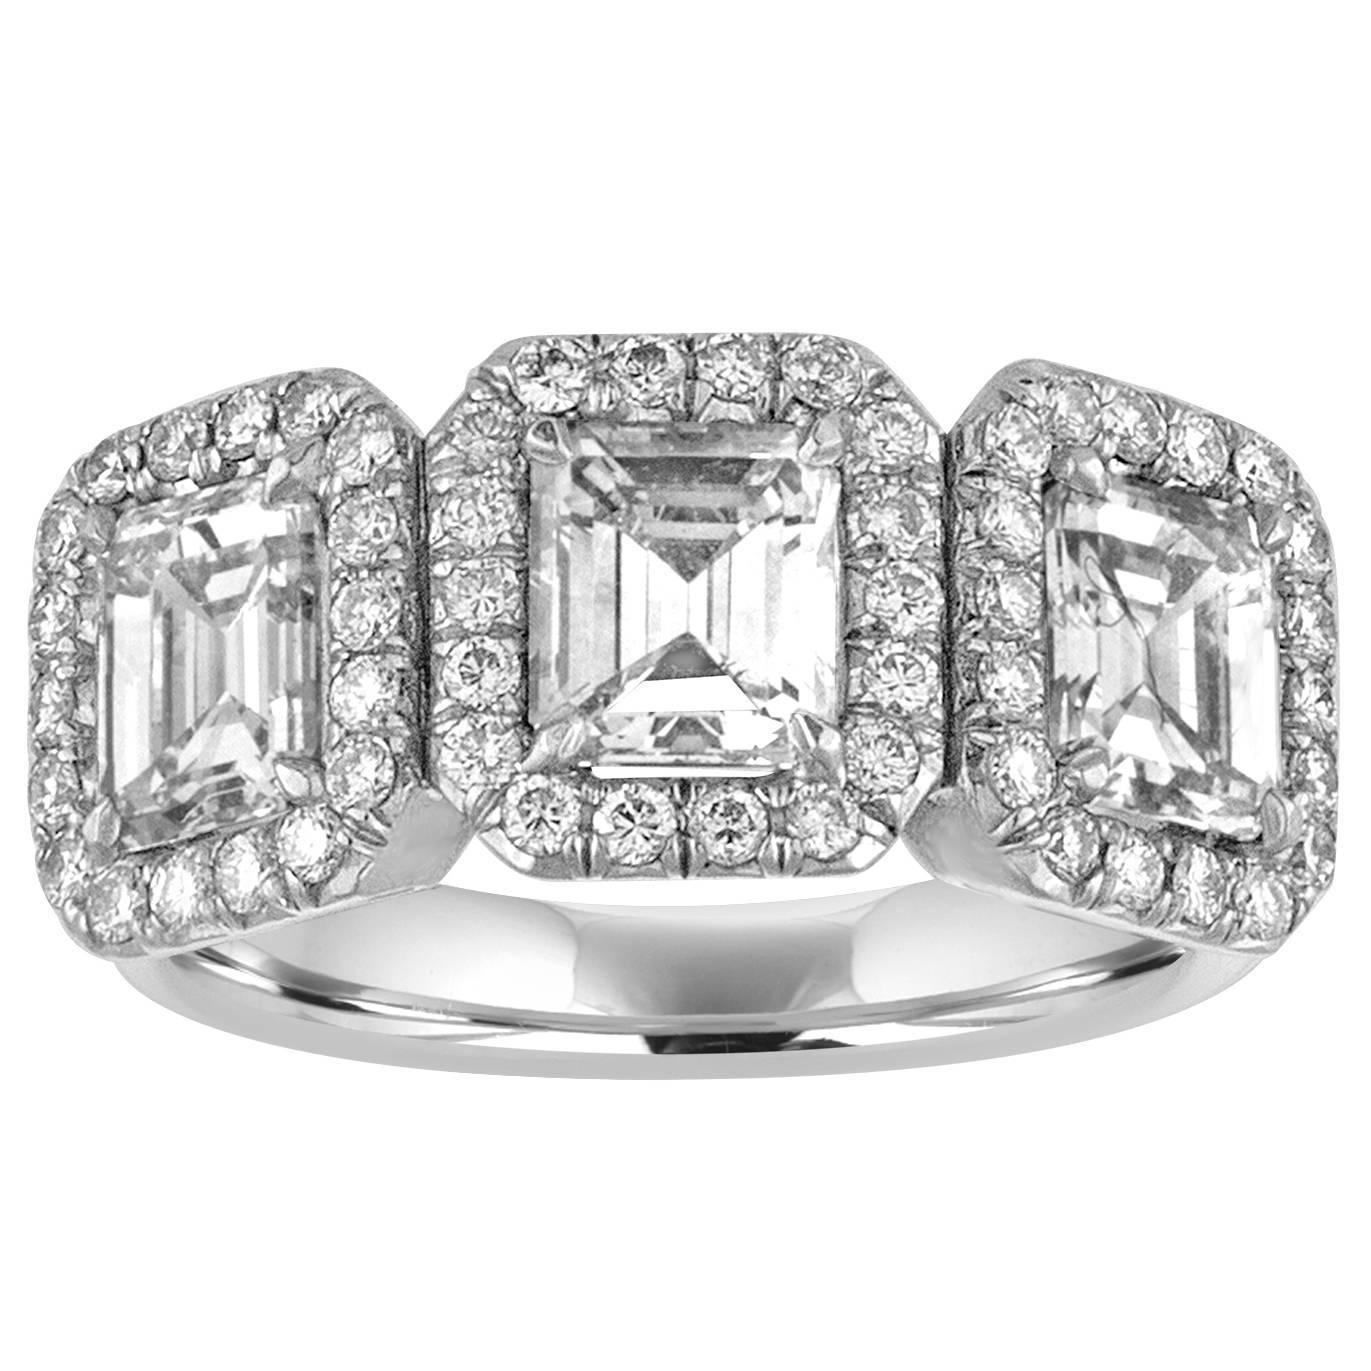 2.80 Carats Diamond Three Stone Emerald Cut Gold Ring